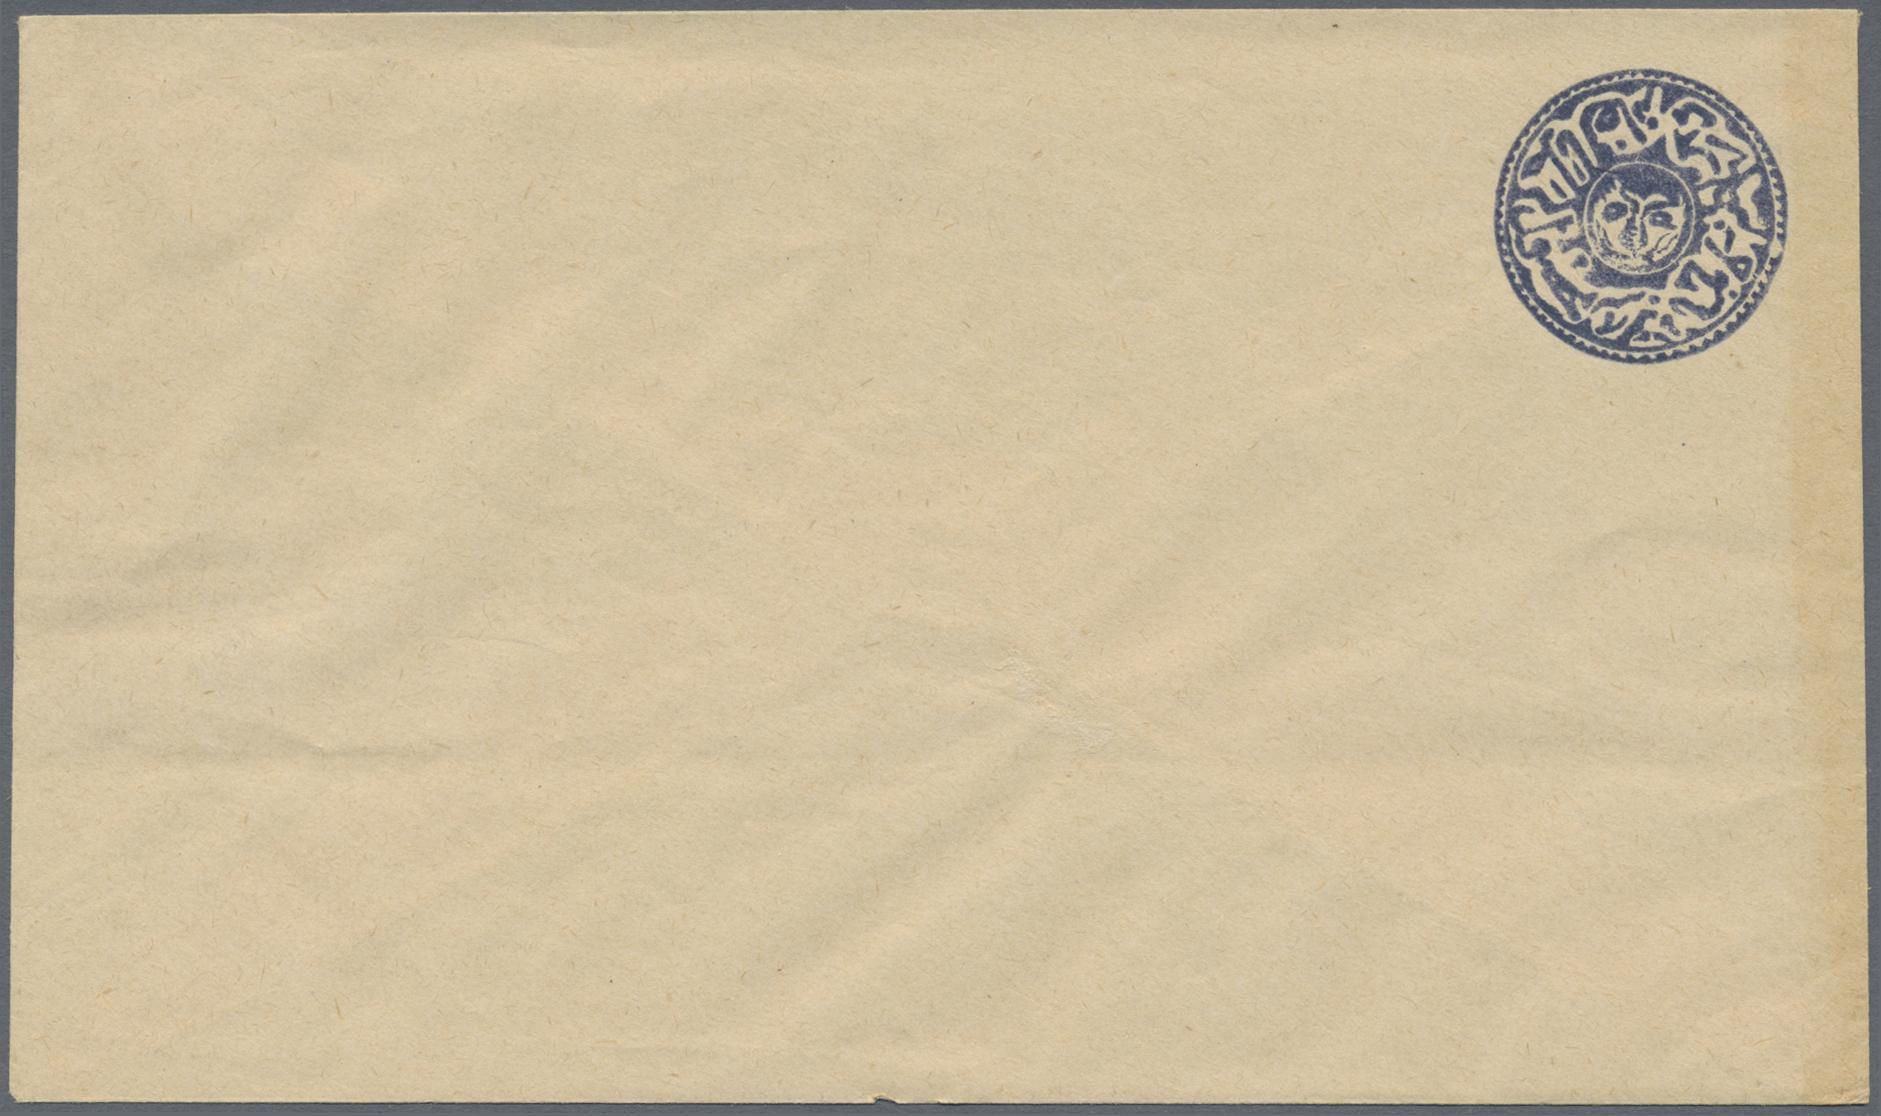 Lot 07019 - Afghanistan - Ganzsachen  -  Auktionshaus Christoph Gärtner GmbH & Co. KG Sale #45- ASIA/OVERSEAS/EUROPE